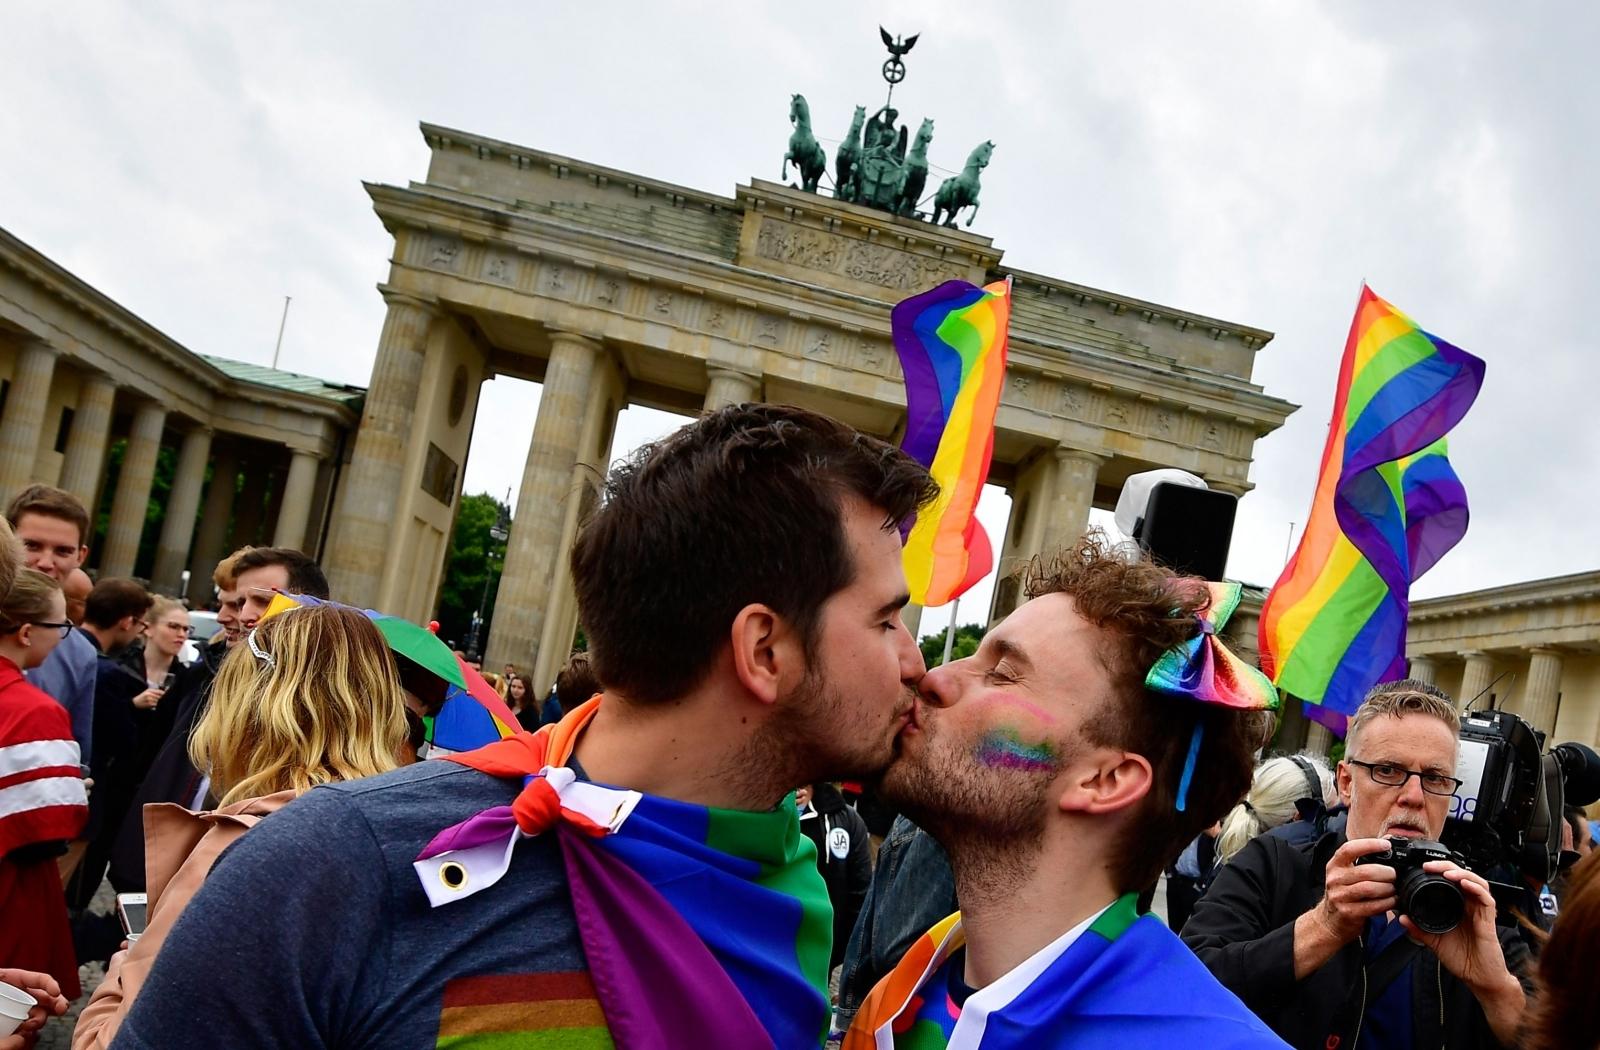 LGBT rally in front of Brandenburg Gate